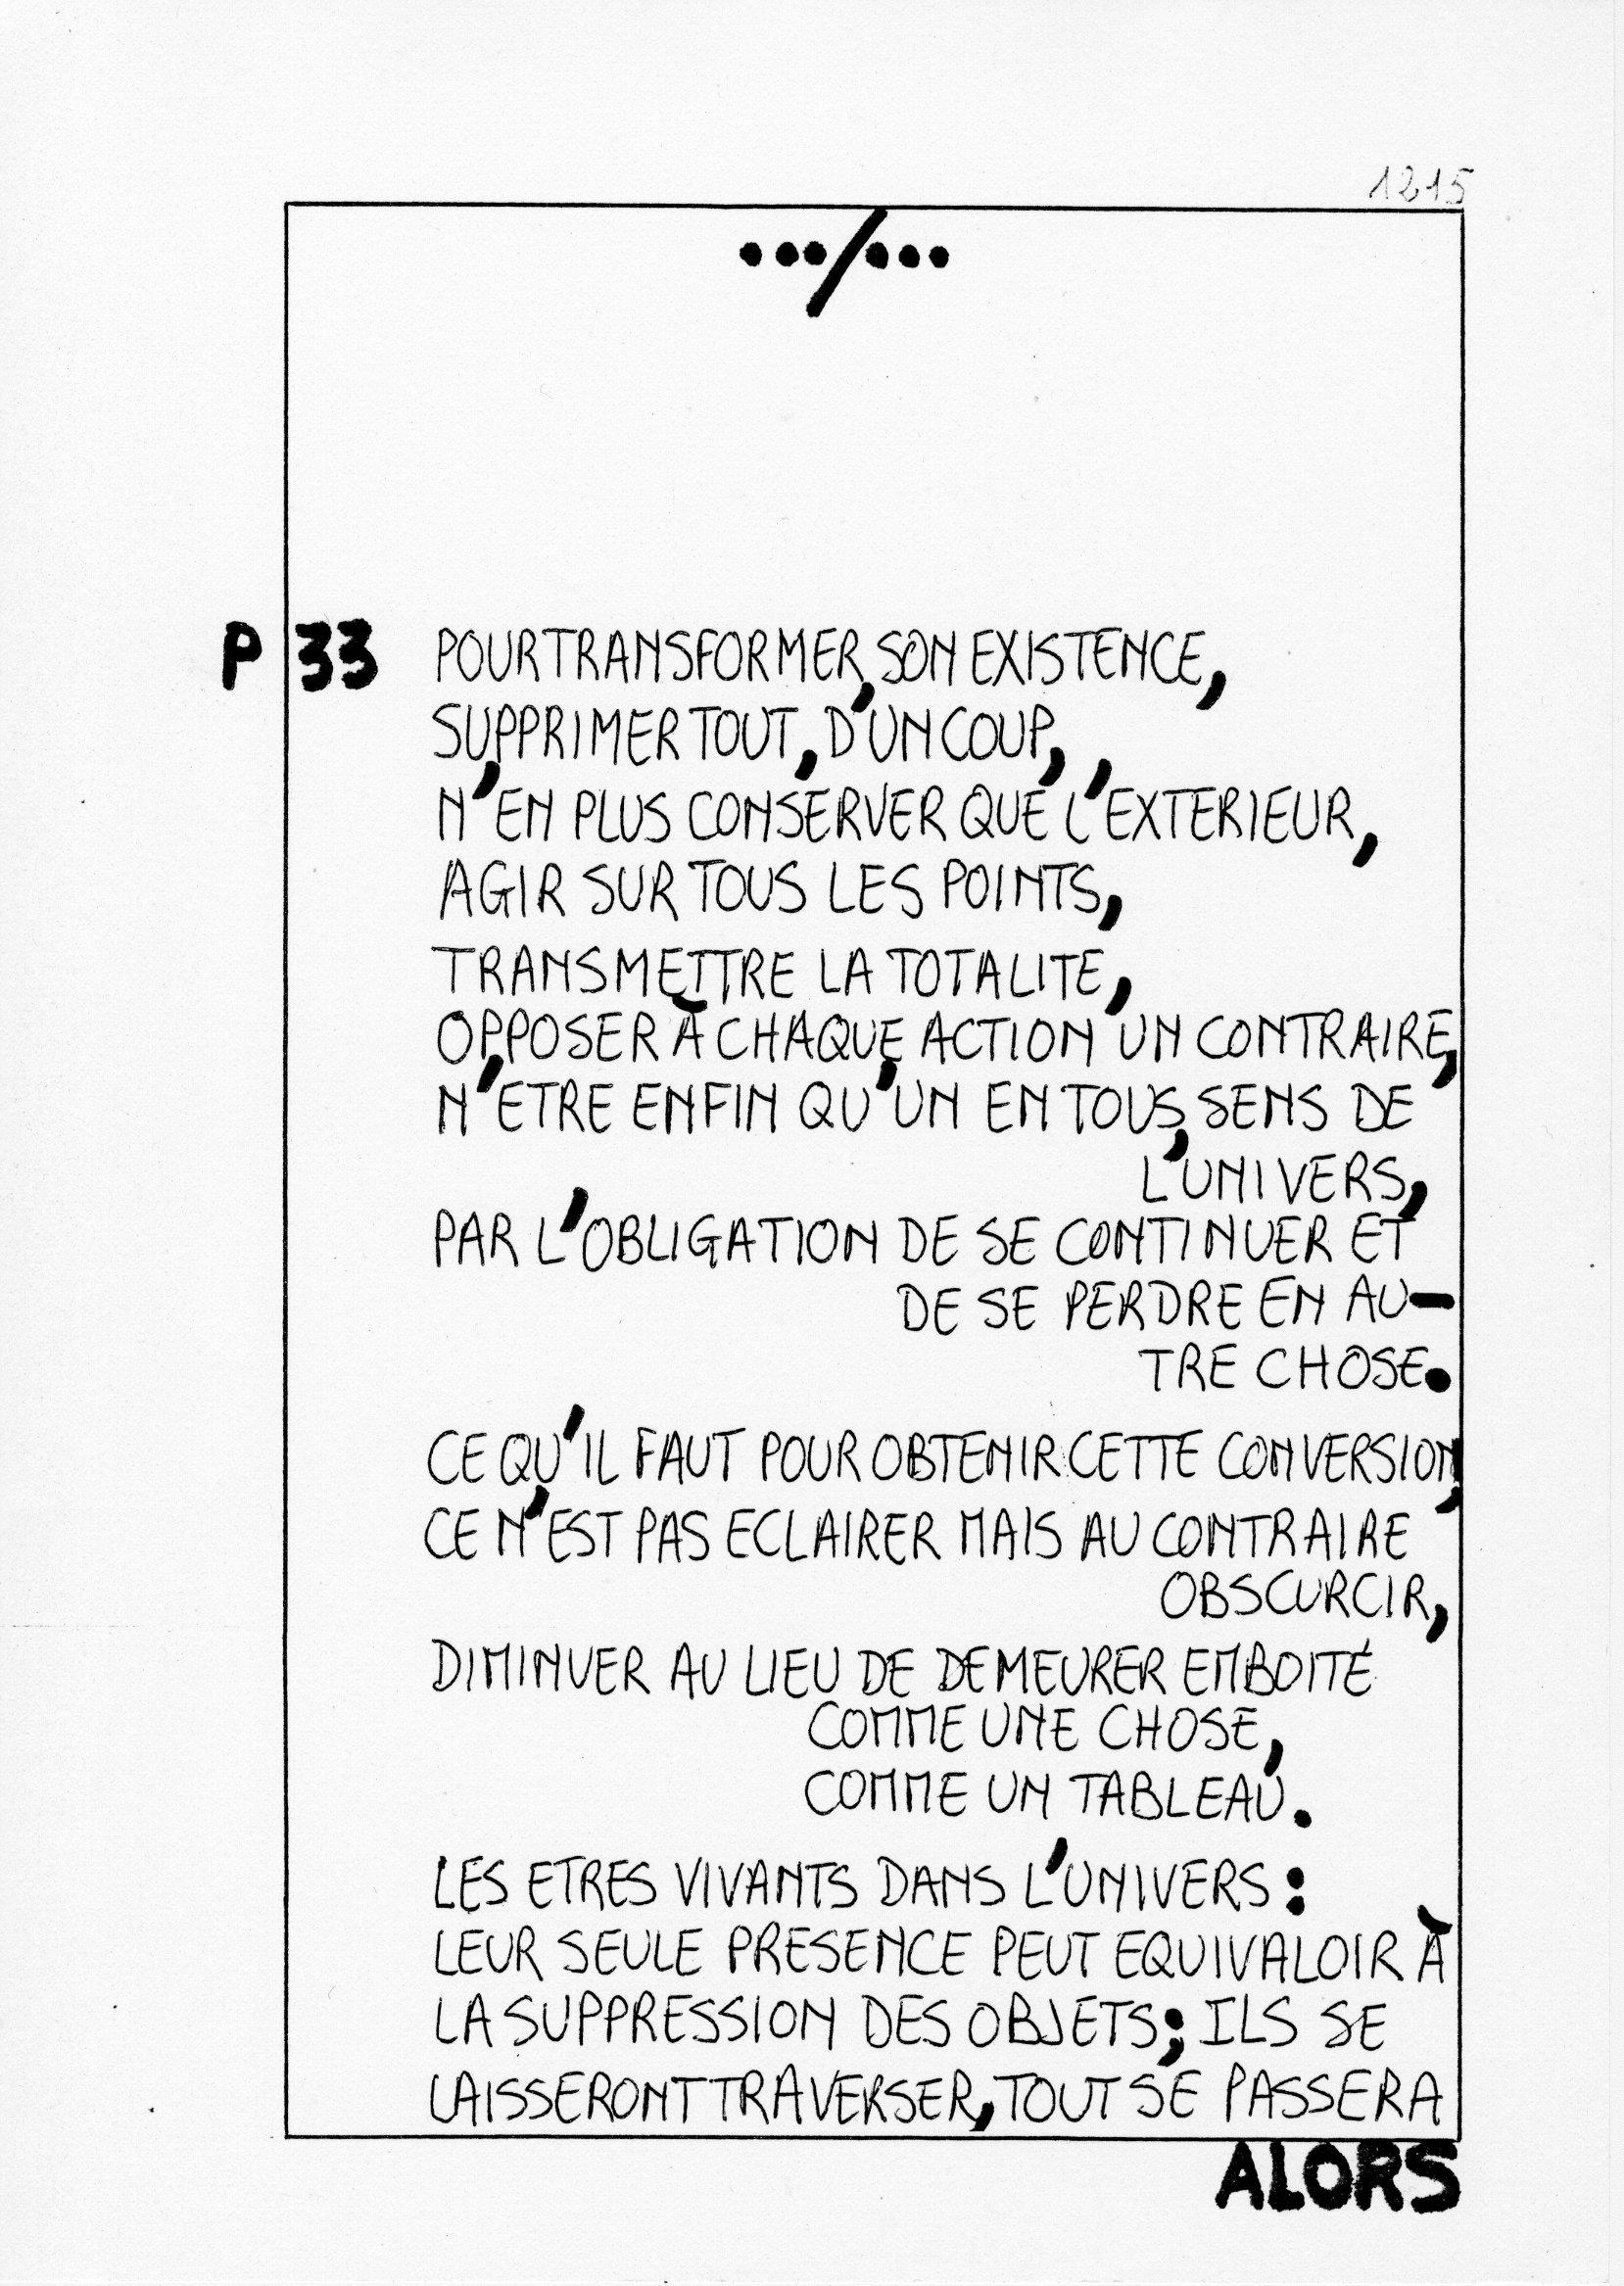 page 1215 D. S. 21 HB